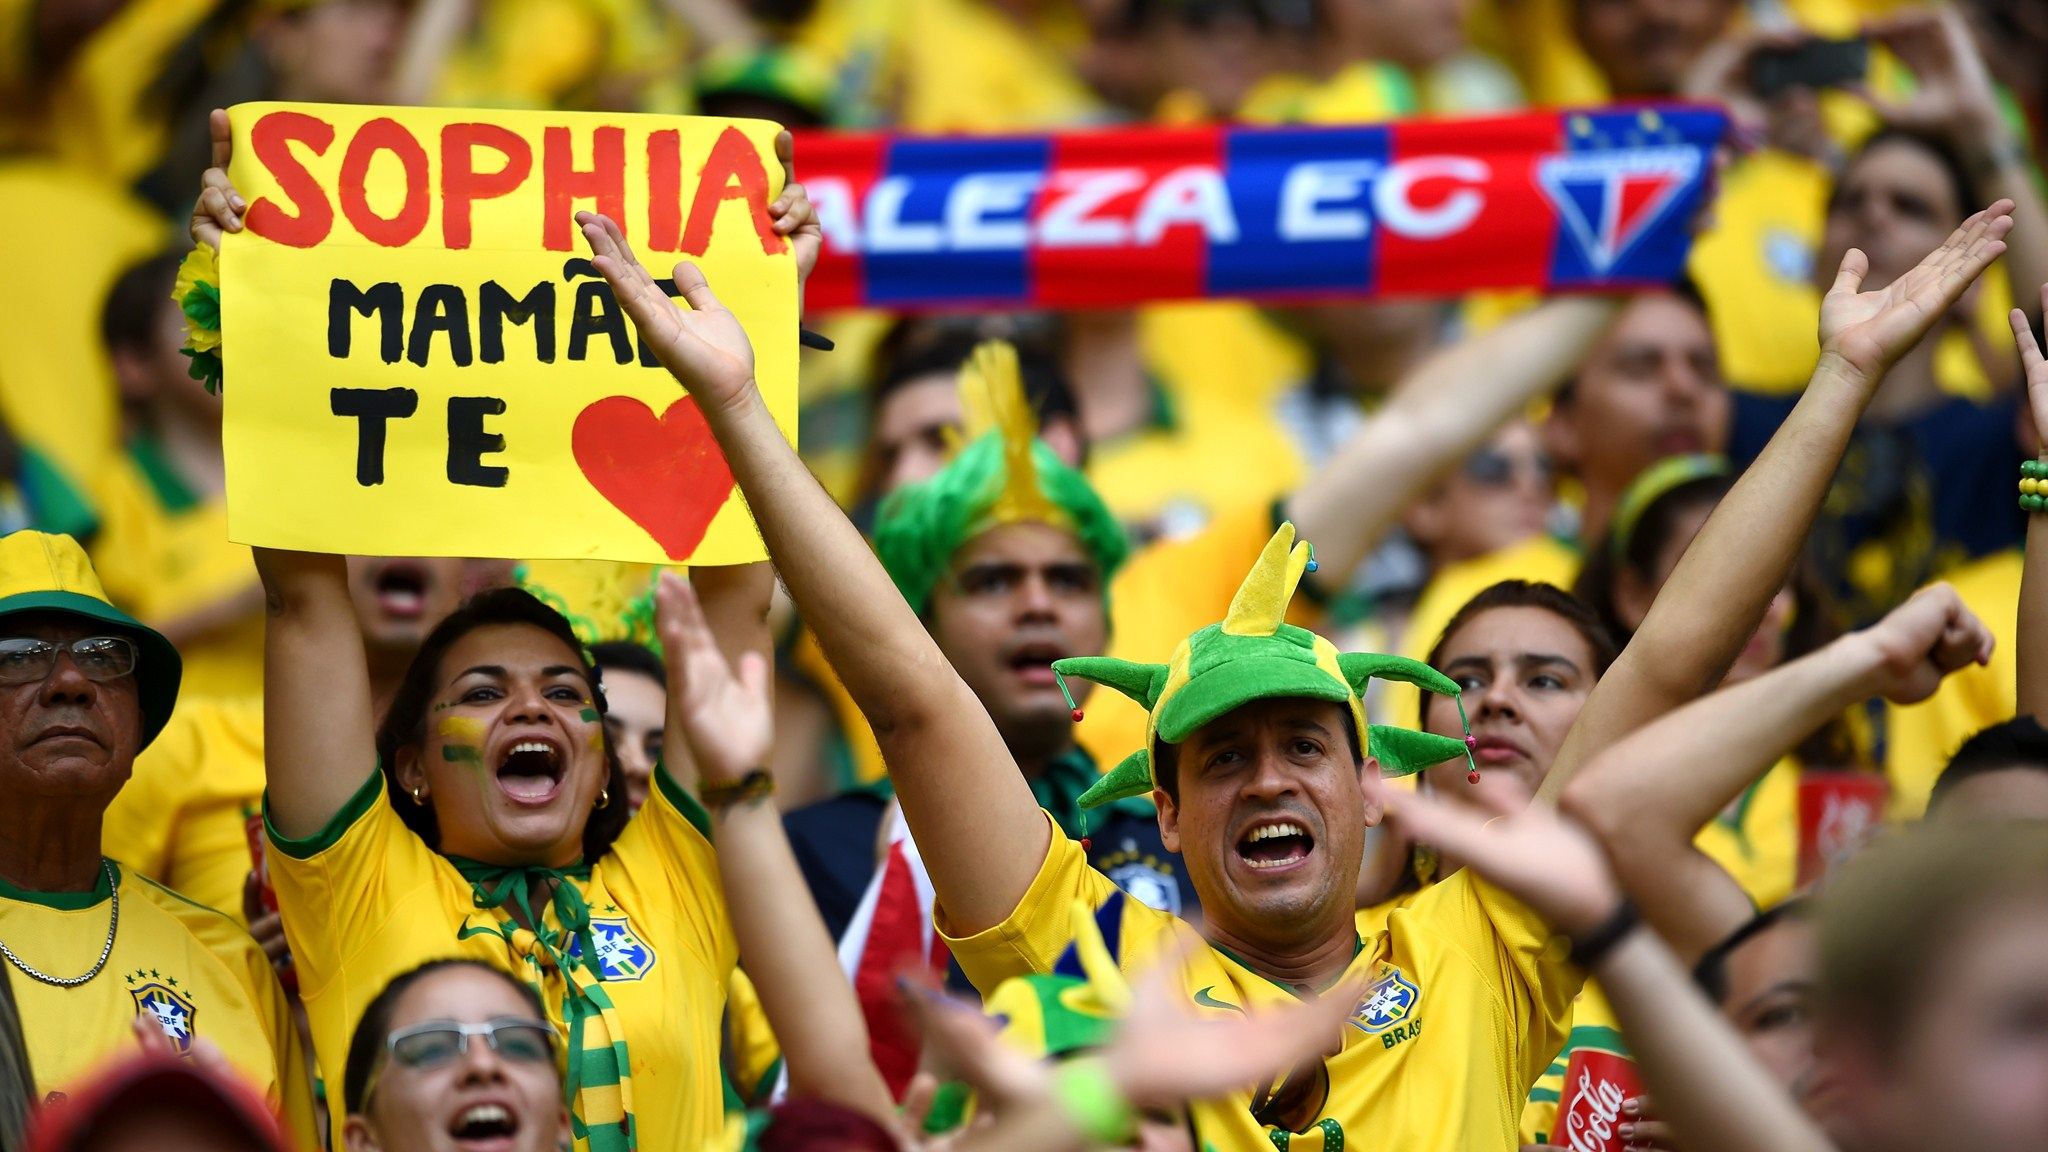 121 - Brazil-Mexico [0-0] -- 17 Jun 2014 - 16-00 -- Fortaleza - Estadio Castelao - kuaza